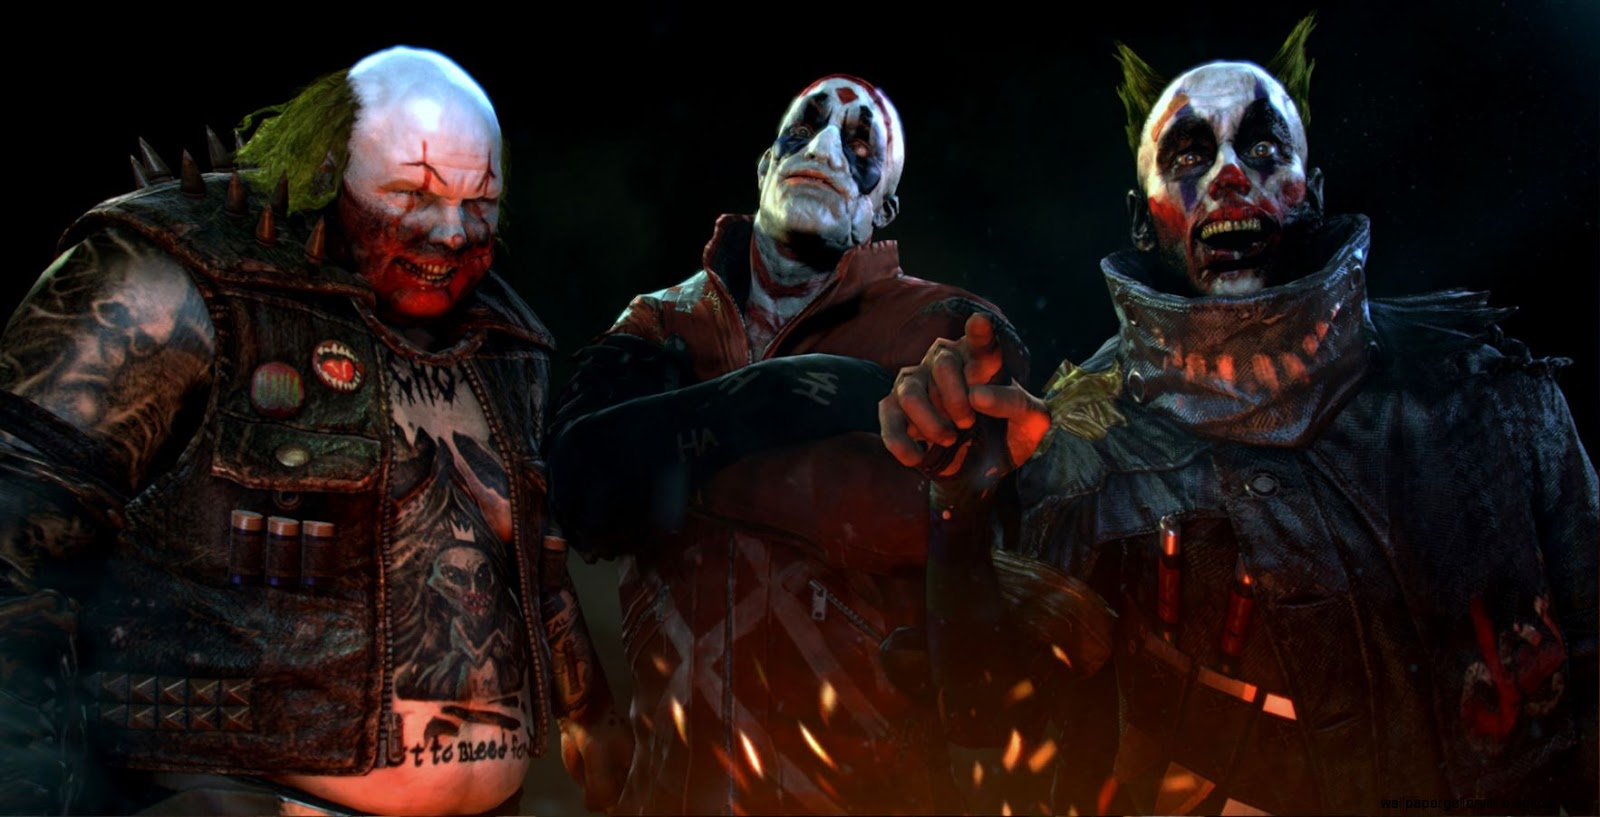 joker in batman arkham origins video games